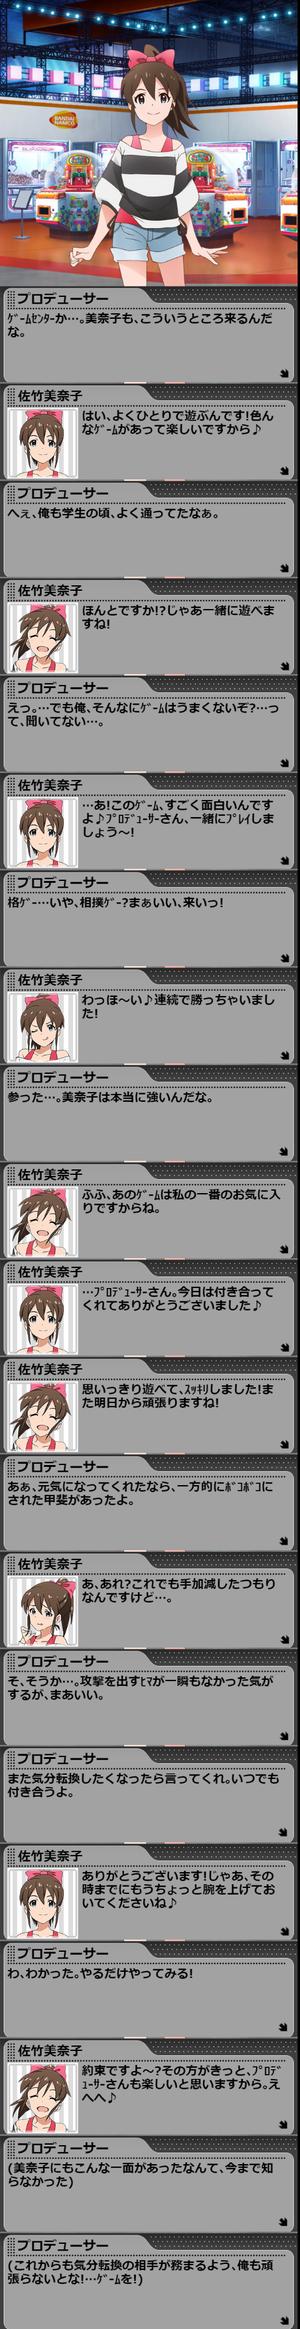 美奈子LV5 (3)